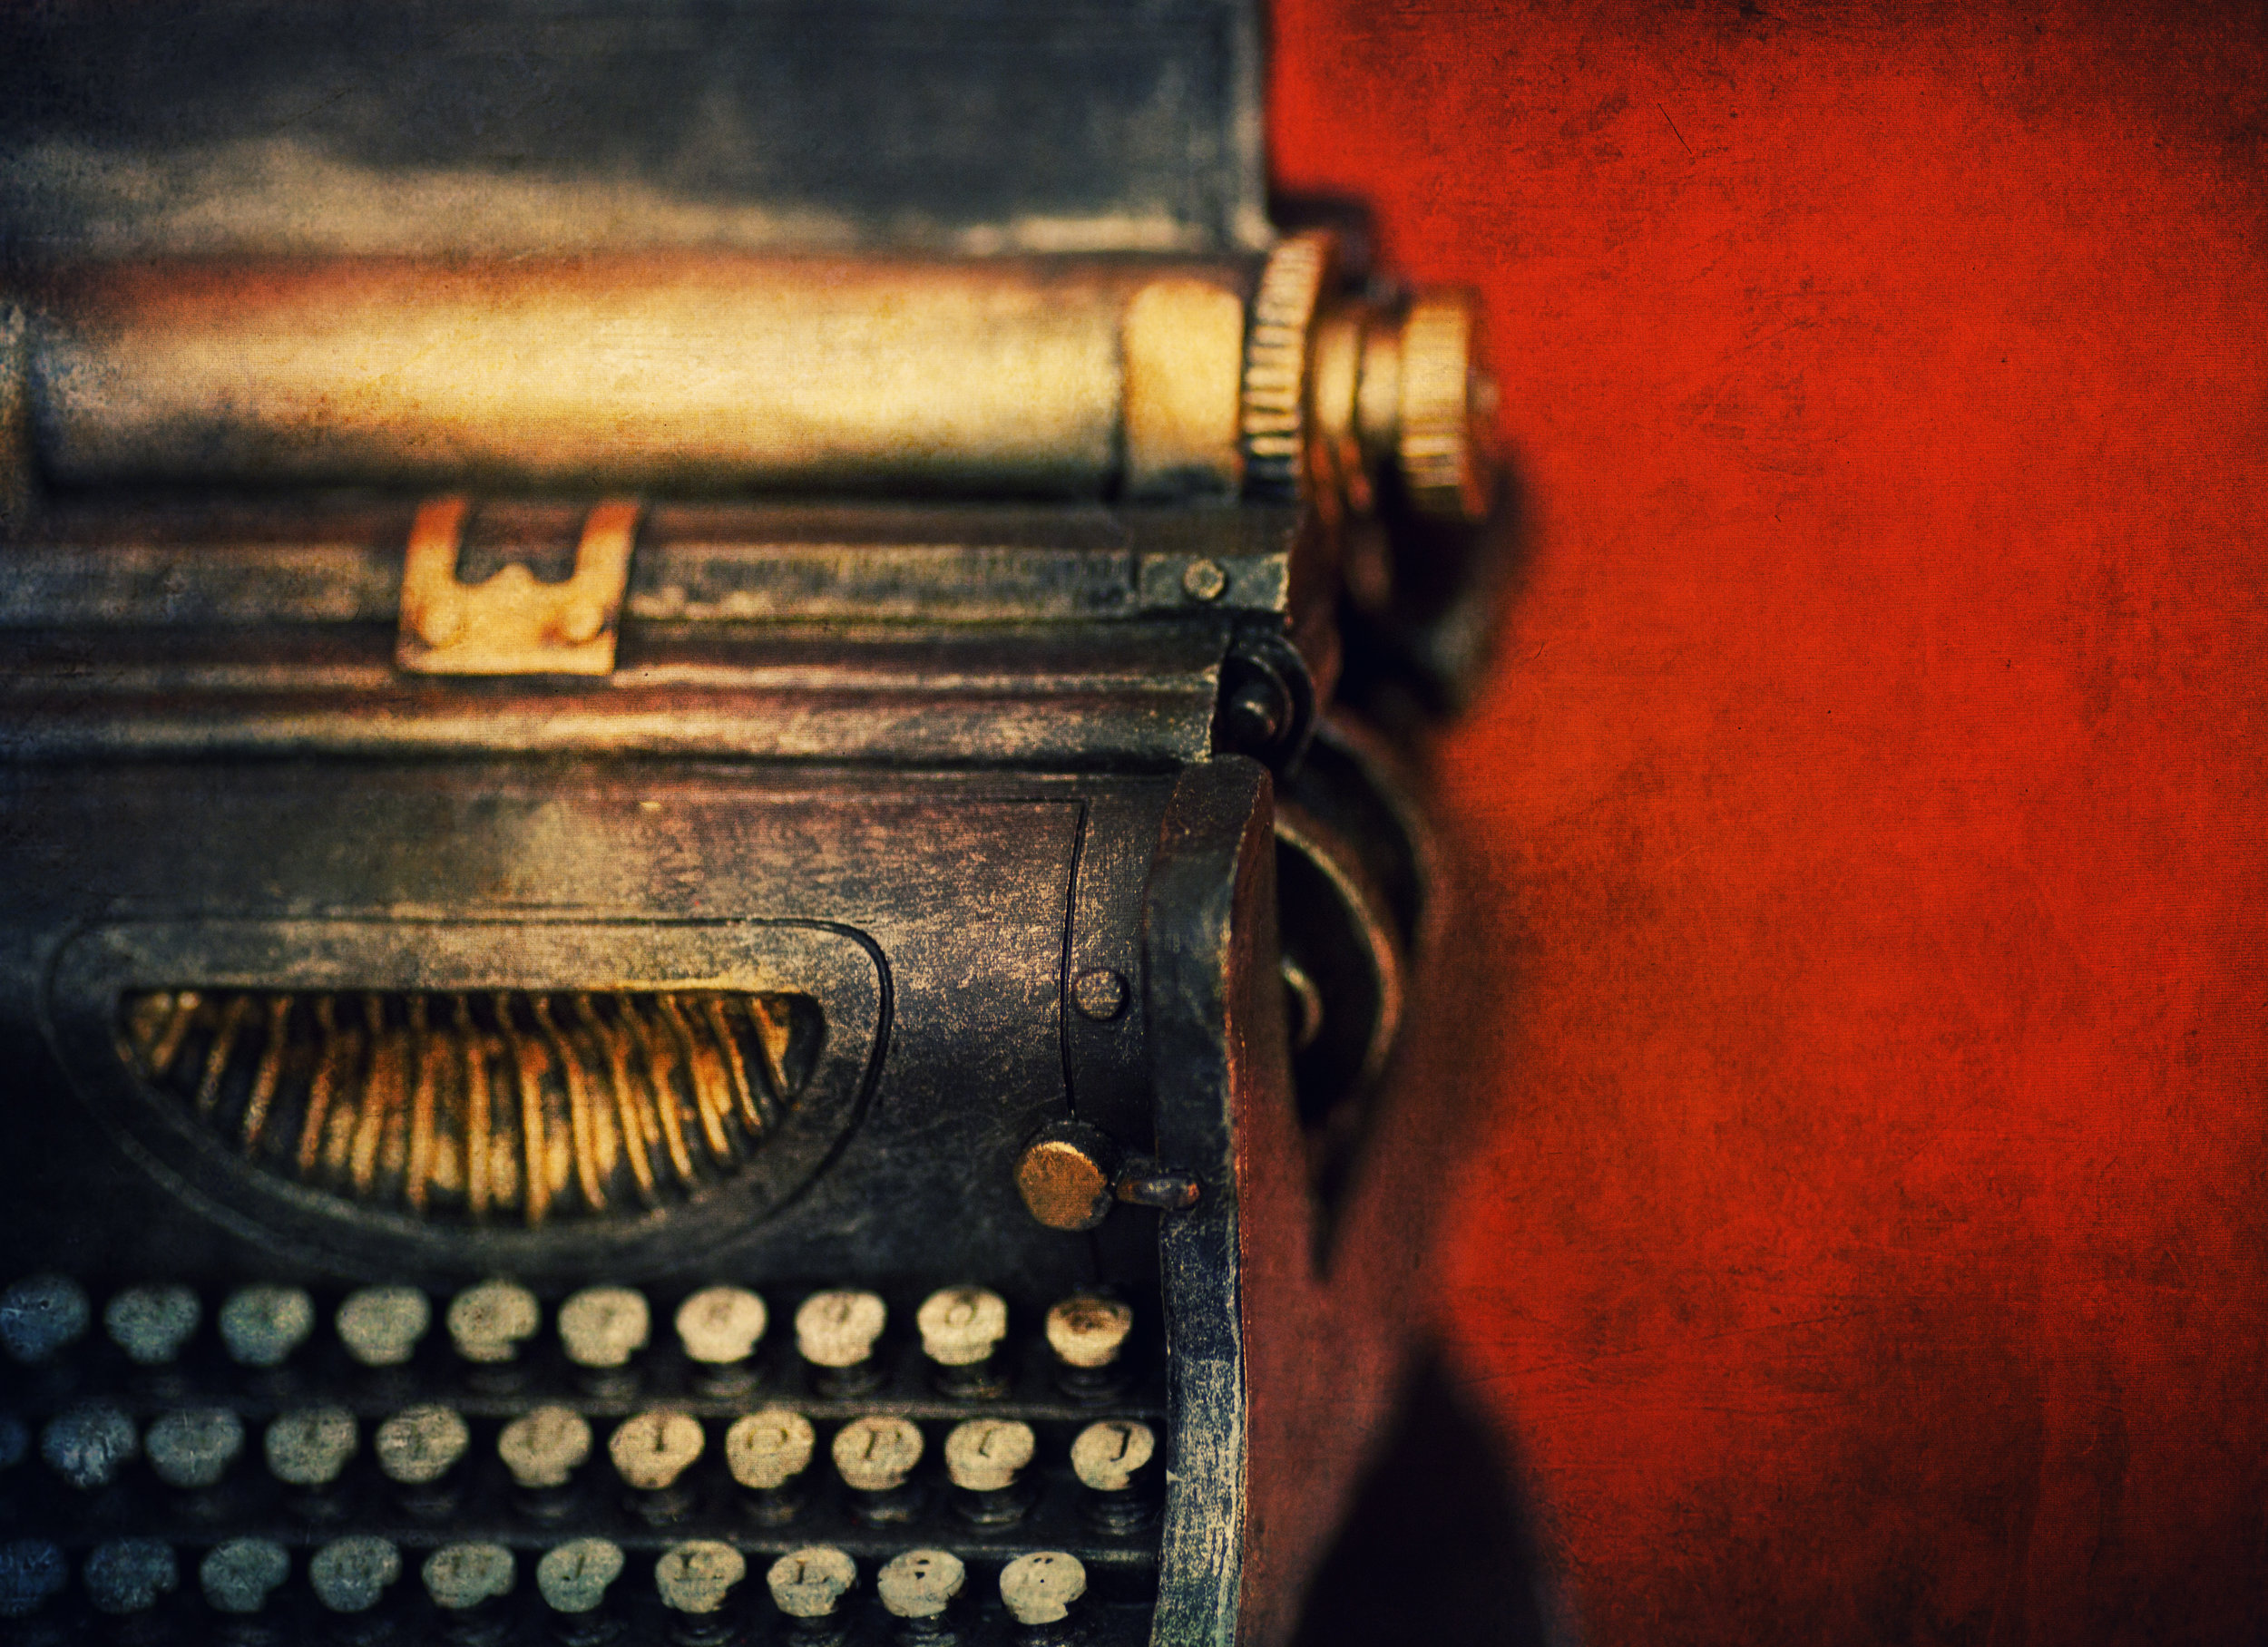 old typewriter border design background.jpg